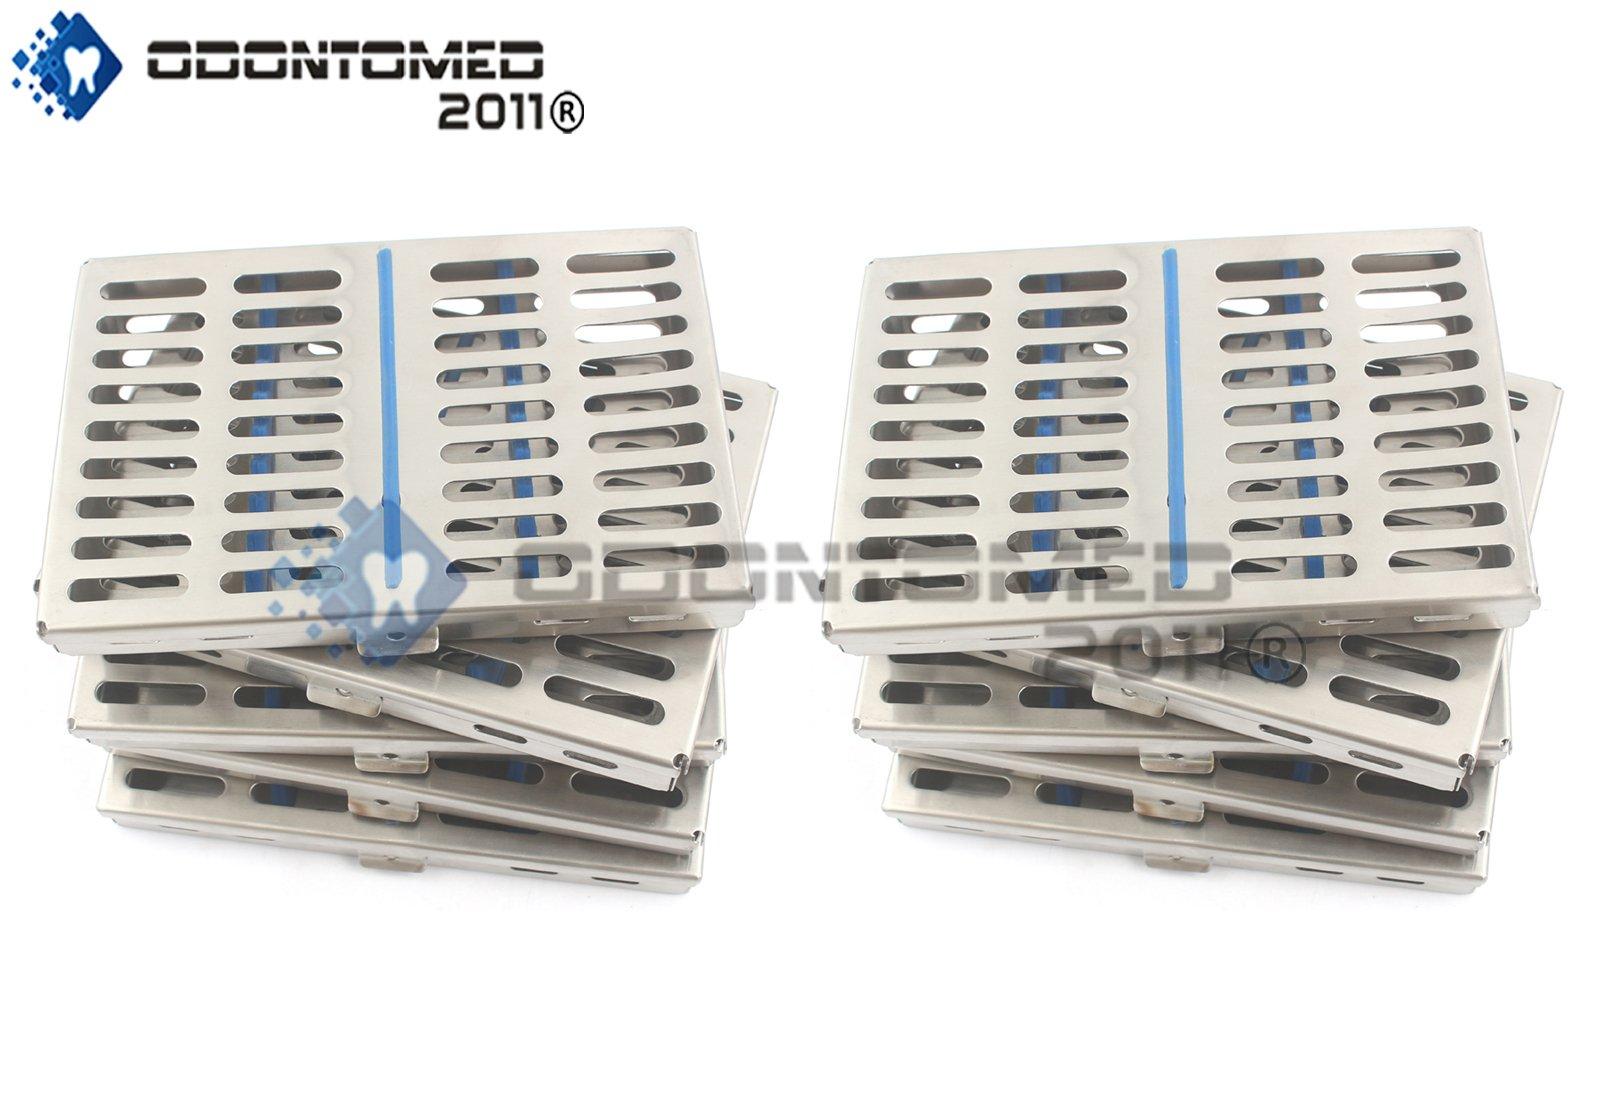 OdontoMed2011 GERMAN GRADE STEEL SET OF 10 DENTAL AUTOCLAVE STERILIZATION CASSETTE RACK BOX TRAY FOR 10 INSTRUMENT ODM